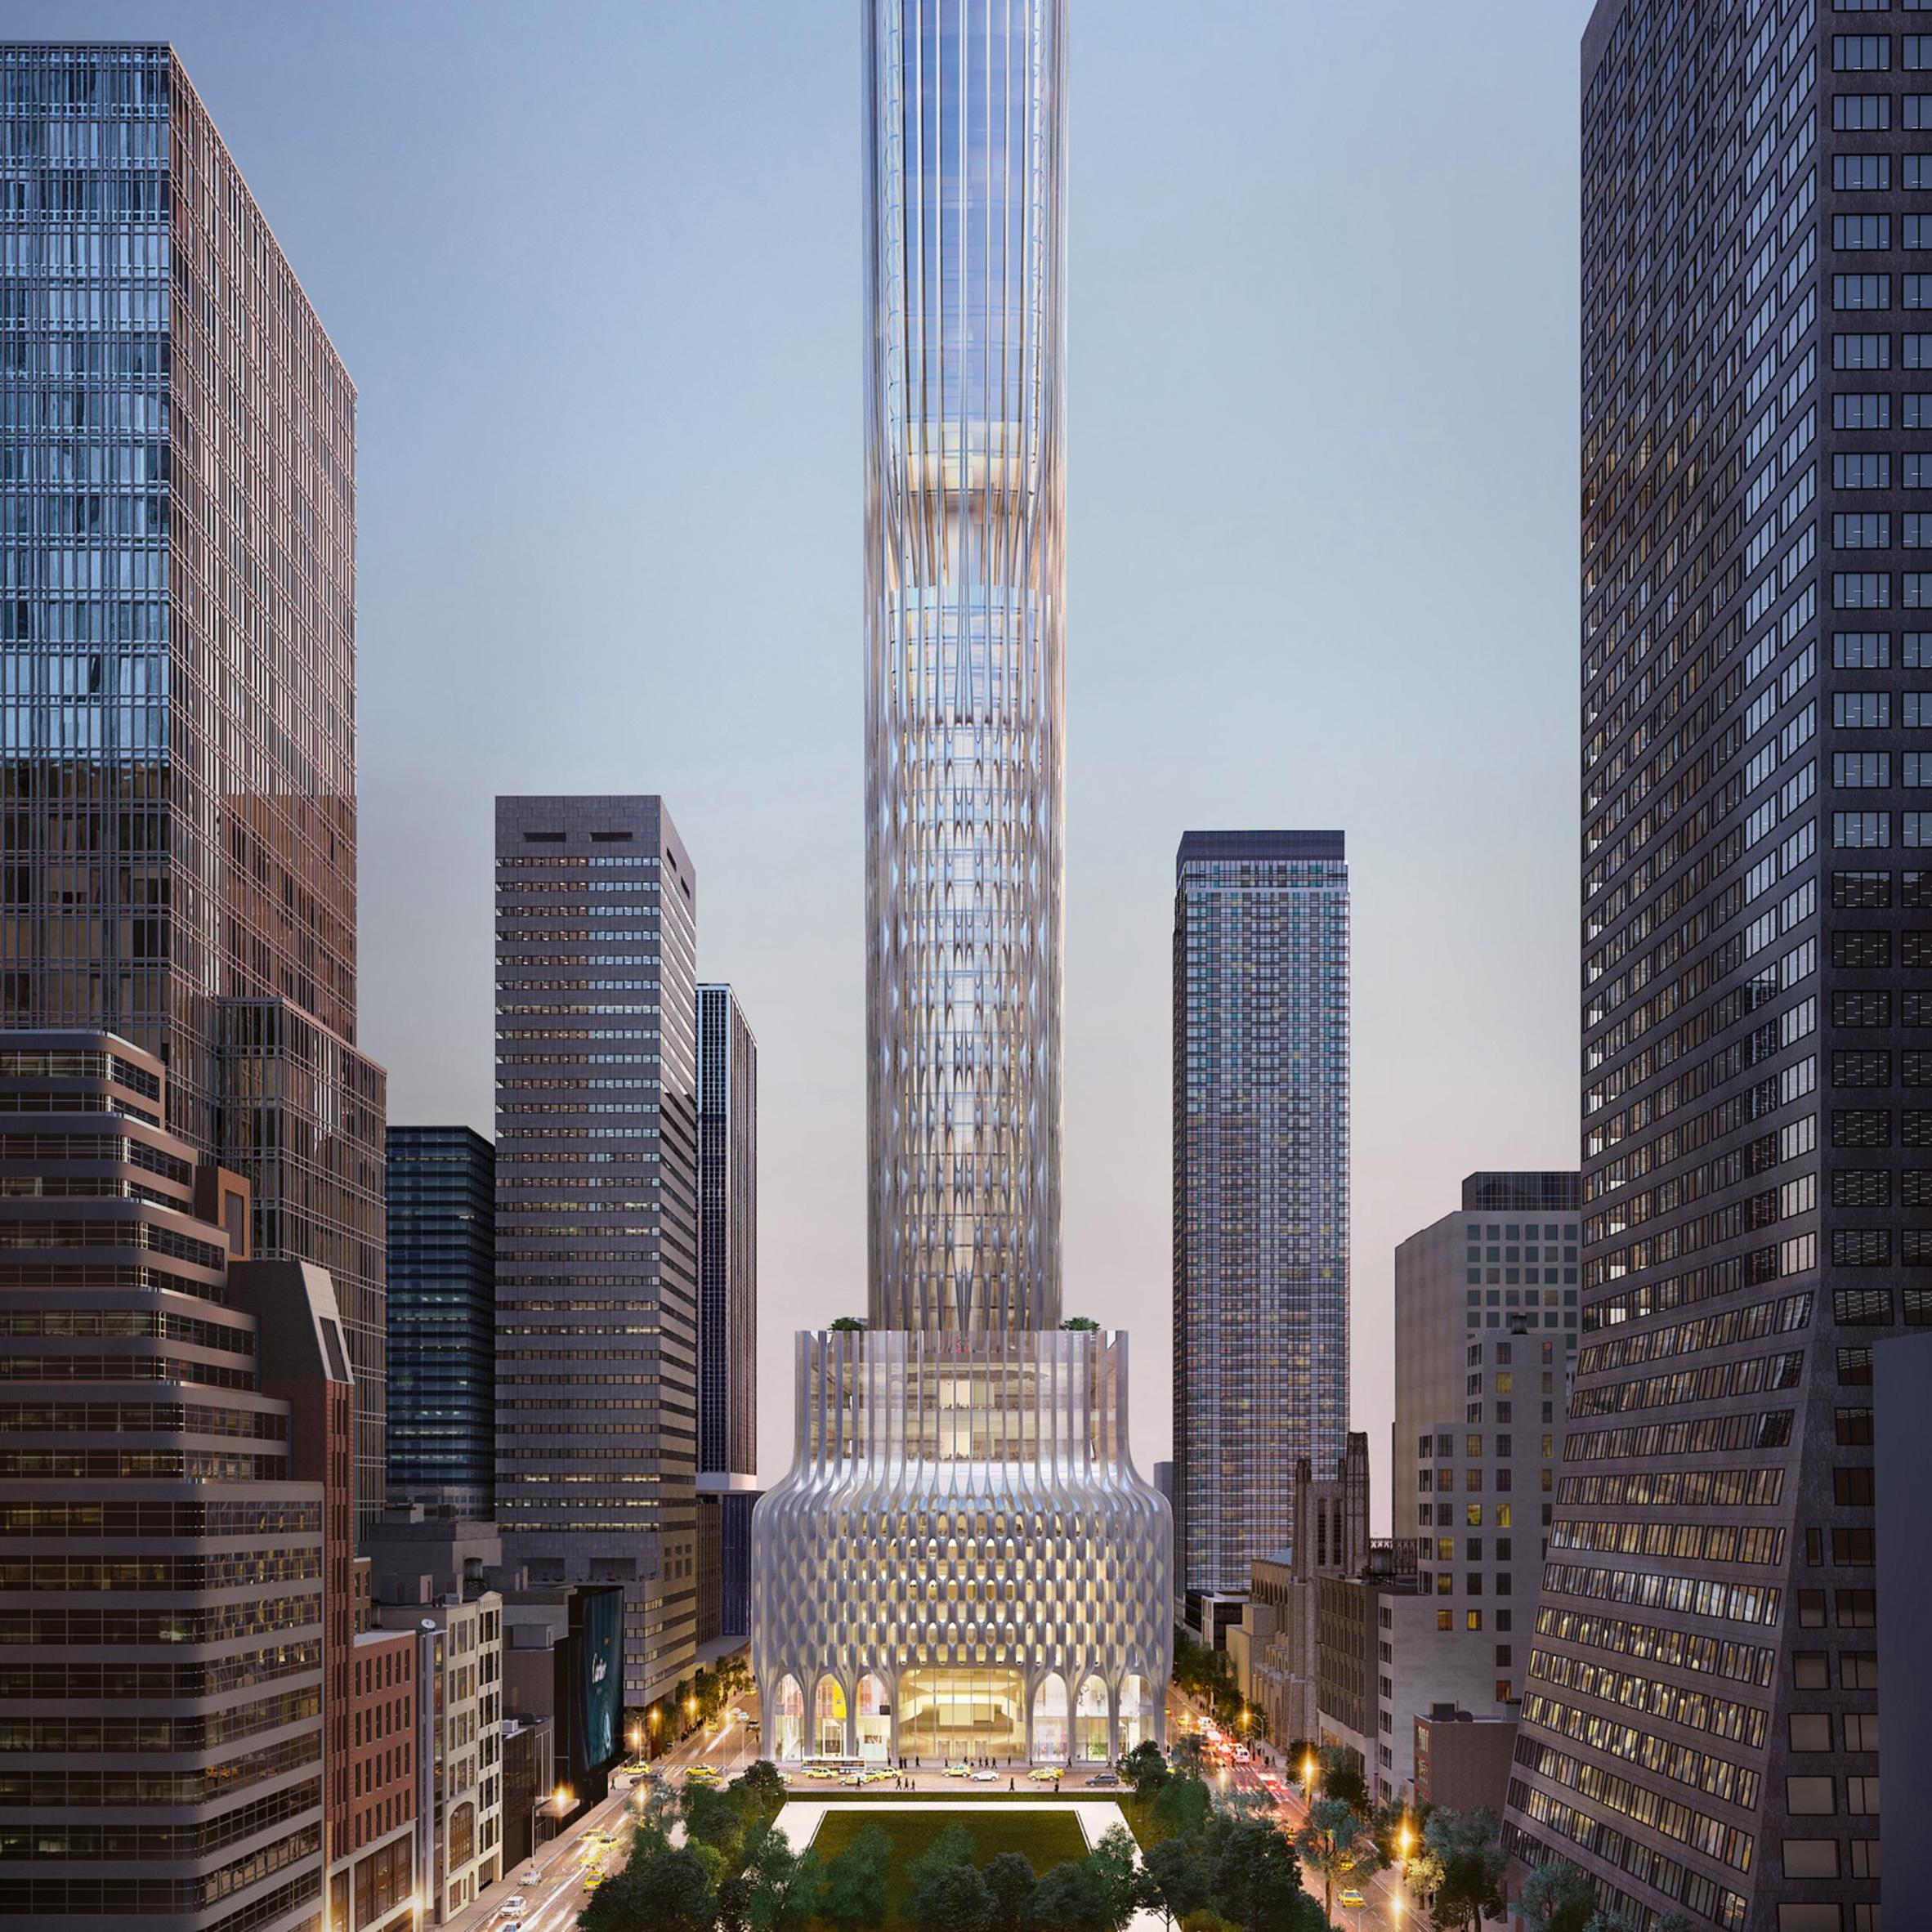 666 Fifth Avenue skyscraper proposal by Zaha Hadid Architects